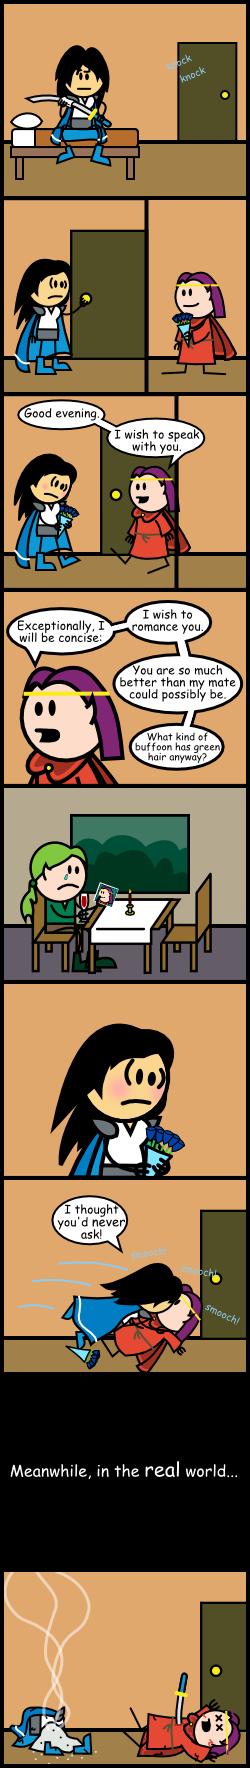 OotS comic 3 by DarkFaun